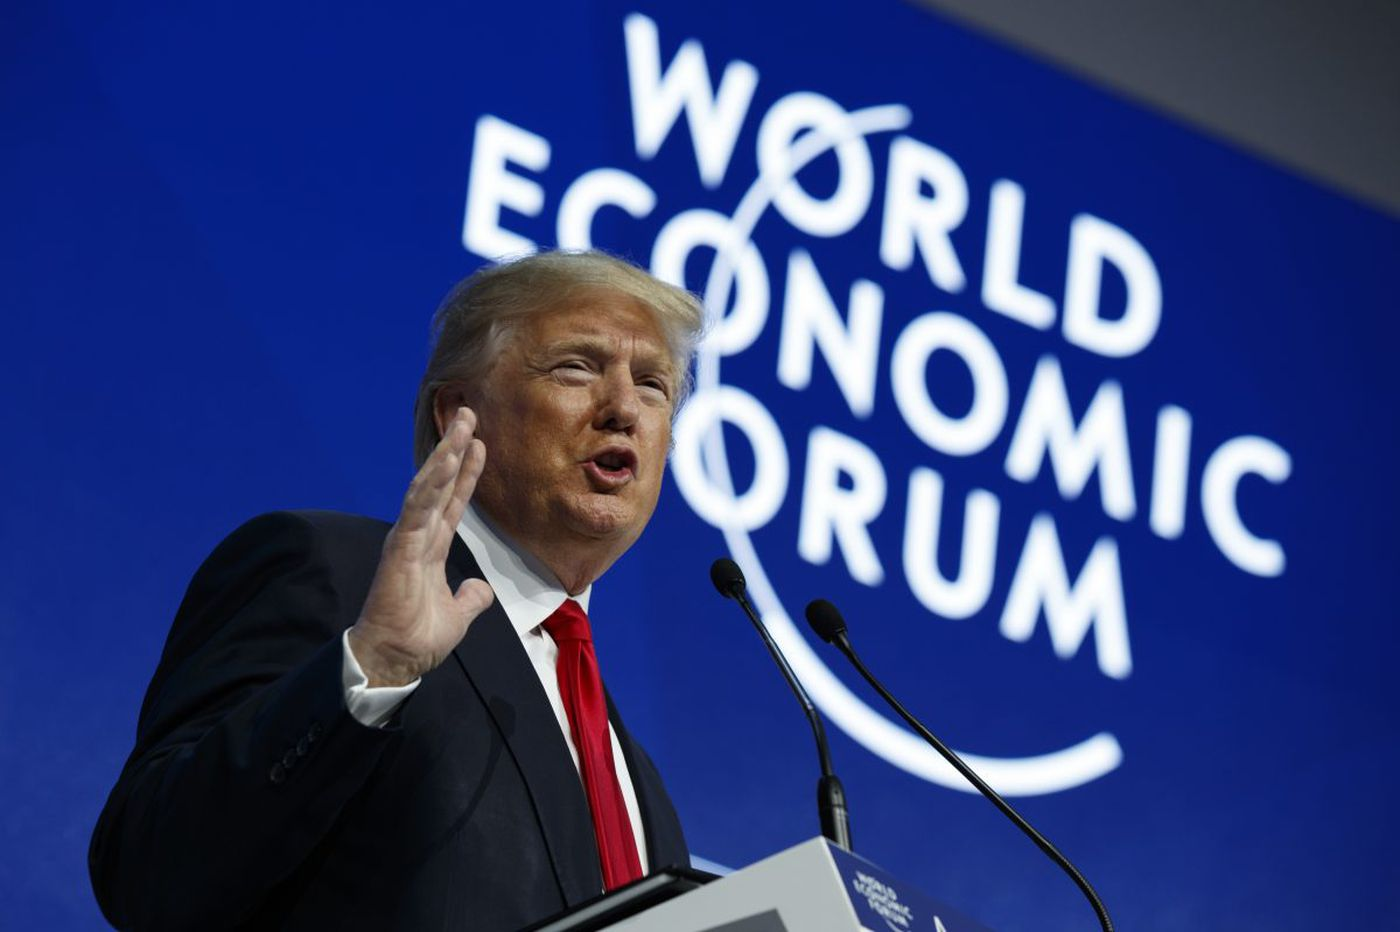 Trump sells America First at Davos Forum | Trudy Rubin